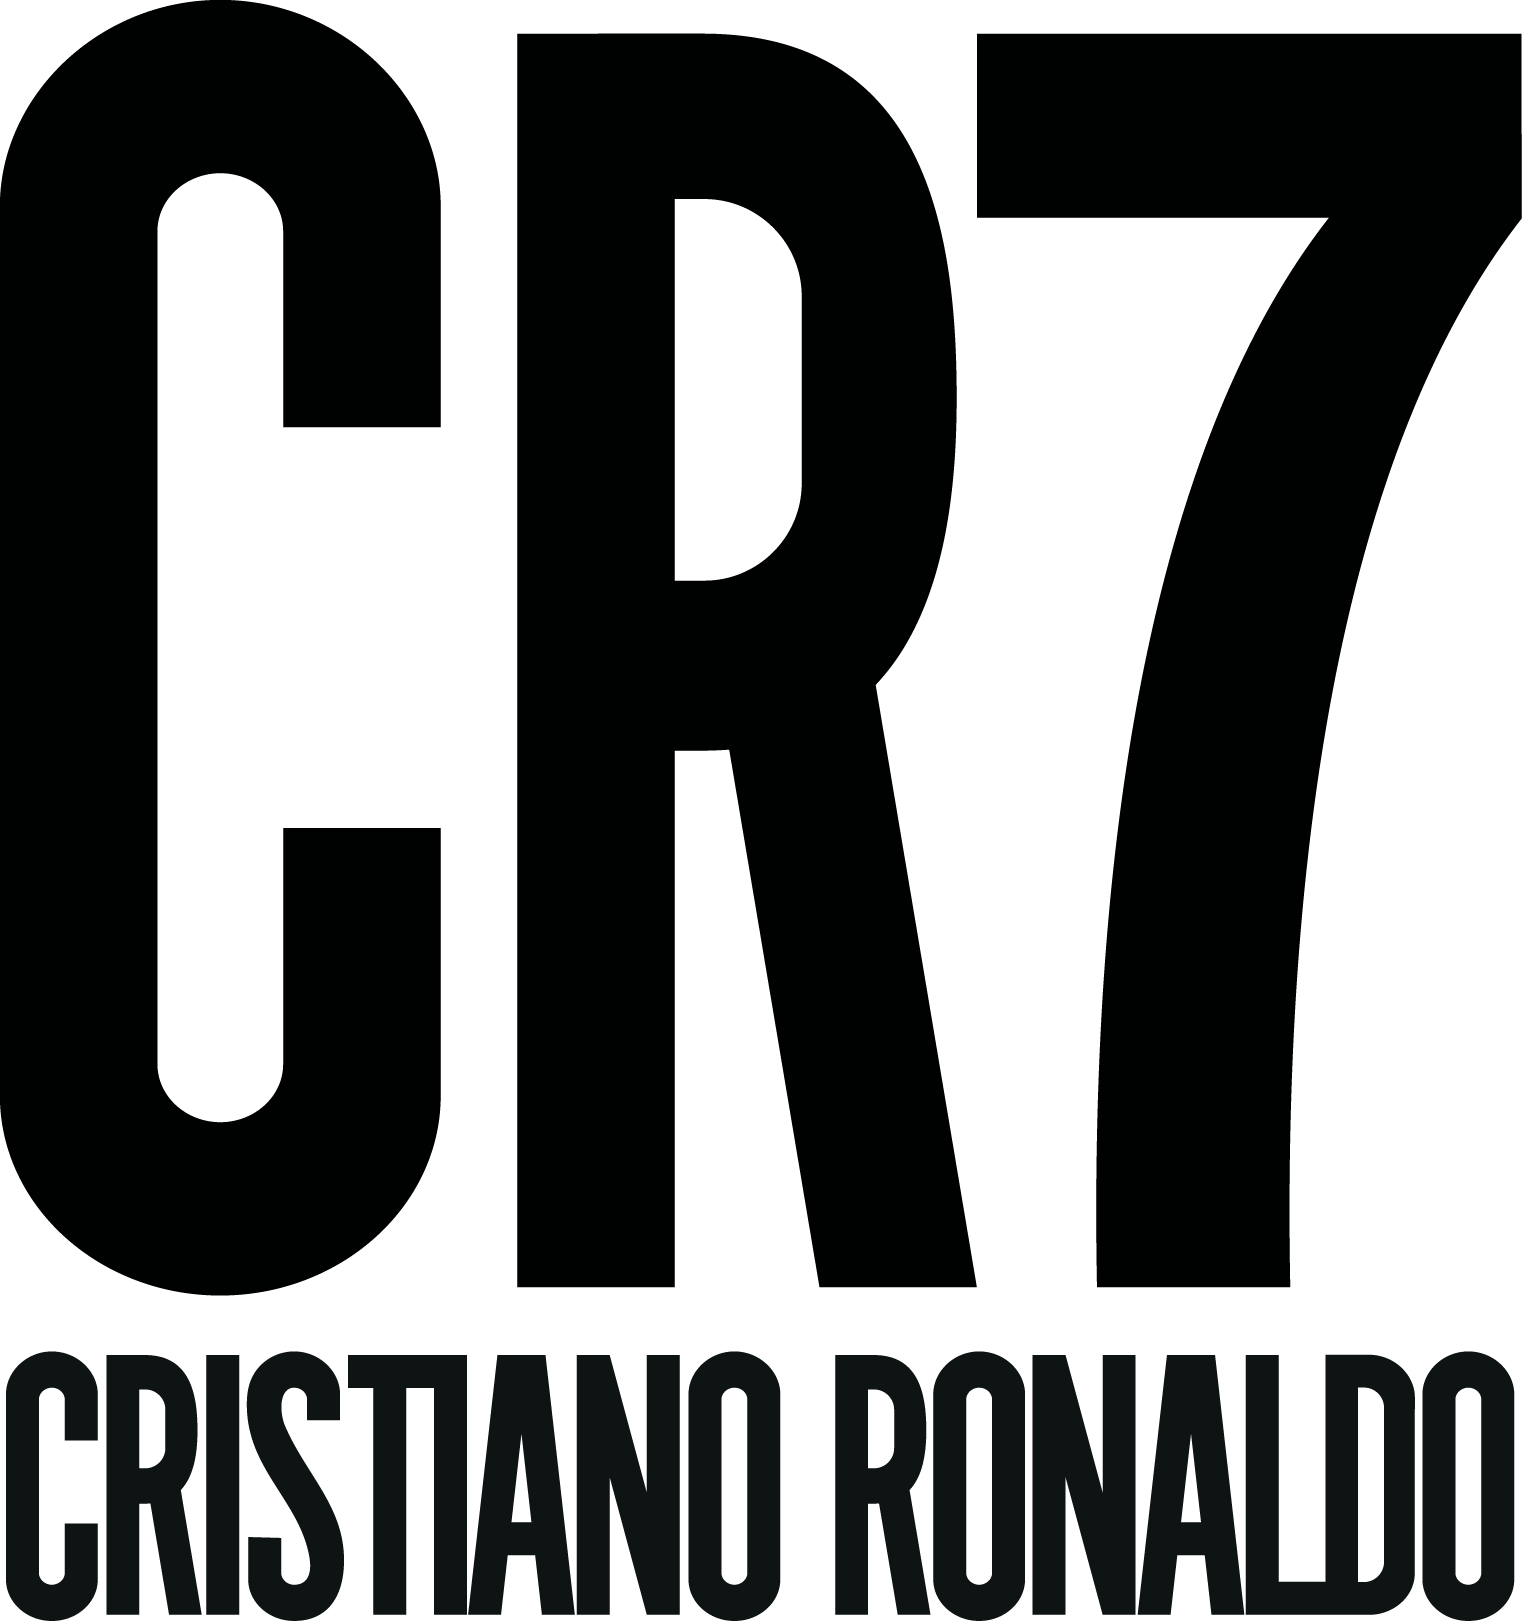 CR7 Logo (Cristiano Ronaldo) png